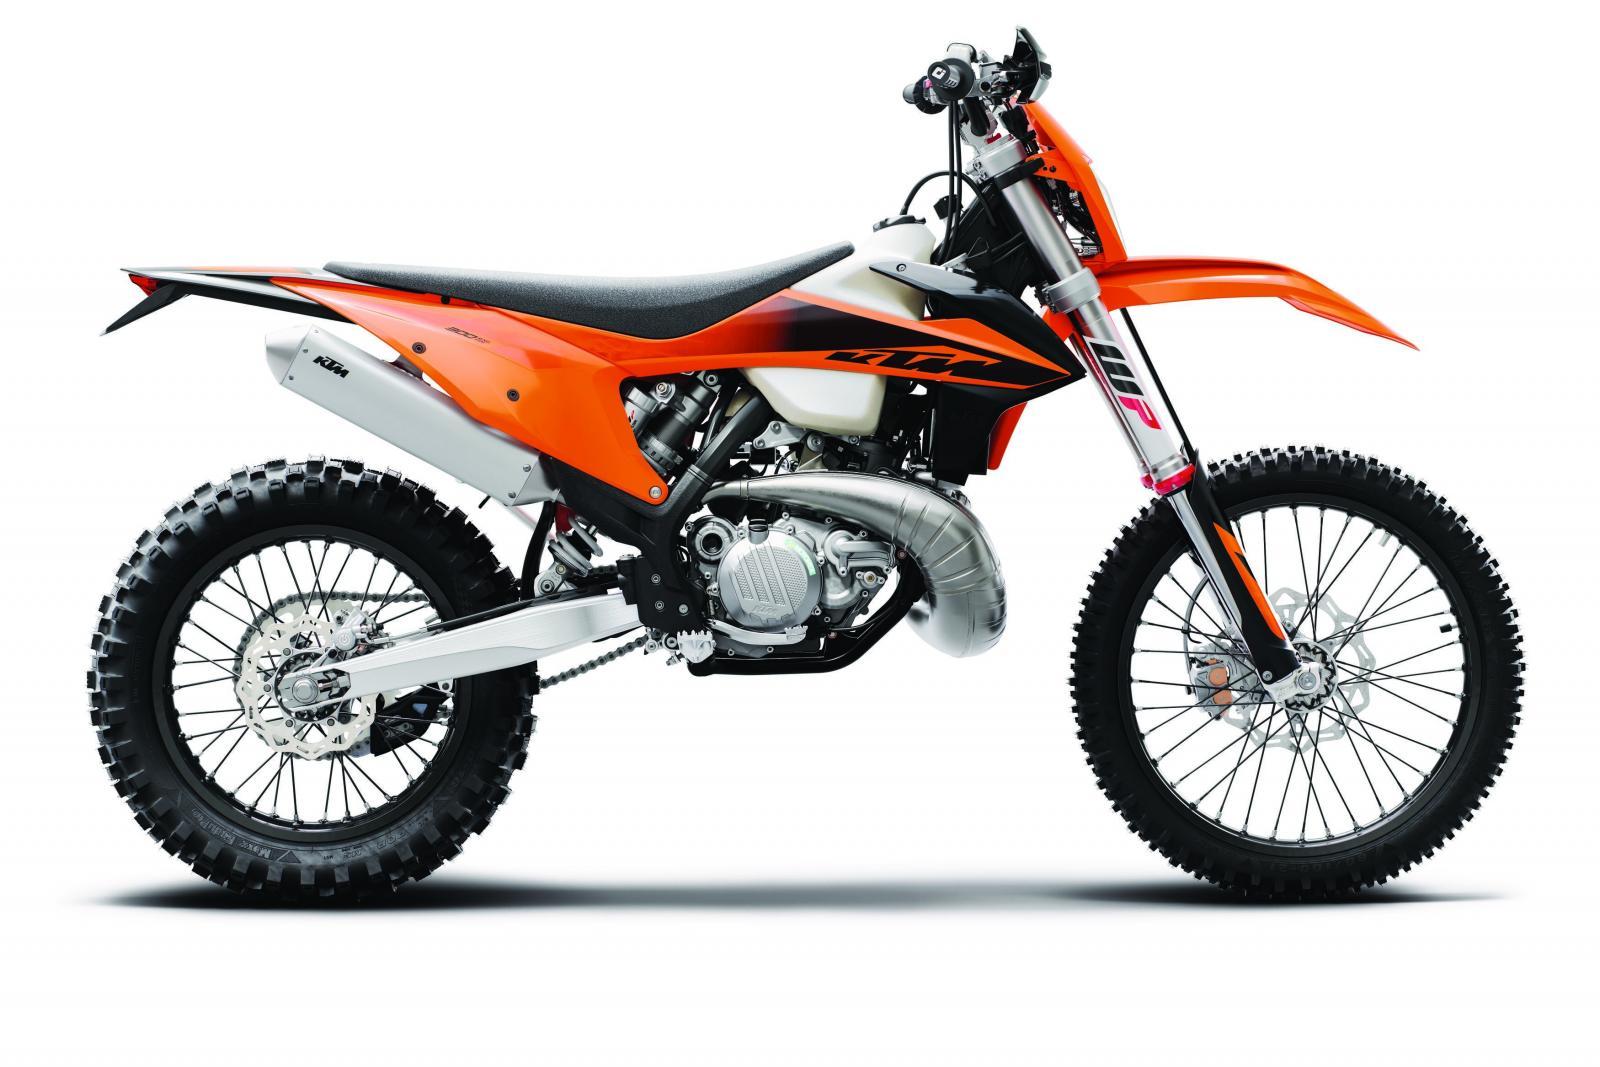 Nya KTM 300 EXC får visa designen...